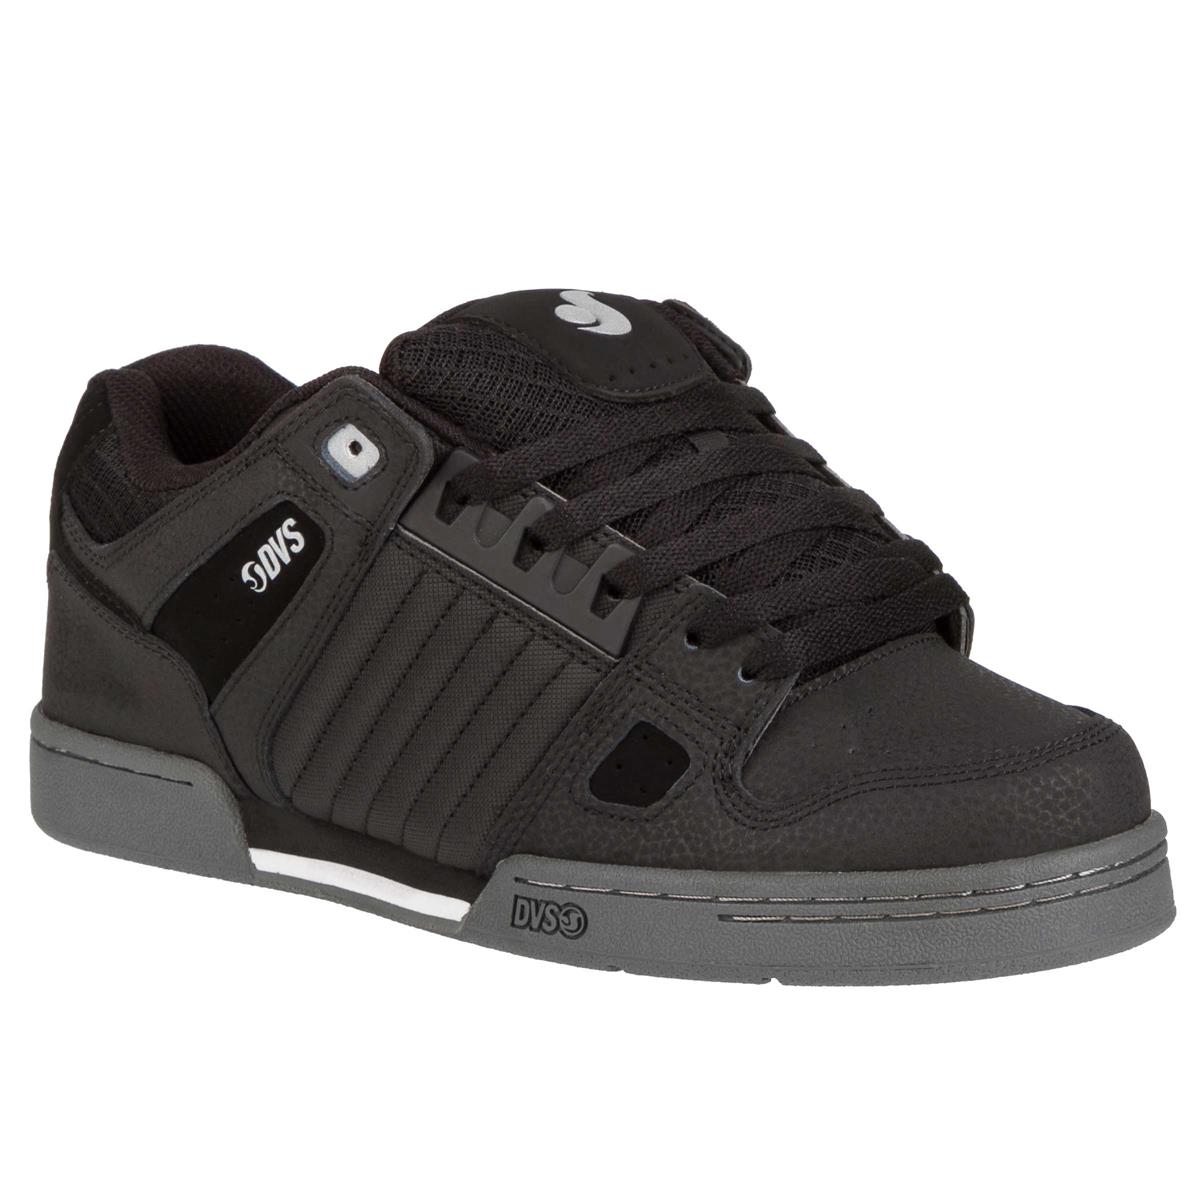 DVS Schuhe Celsius Schwarz/Charcoal/Weiß Nubuk